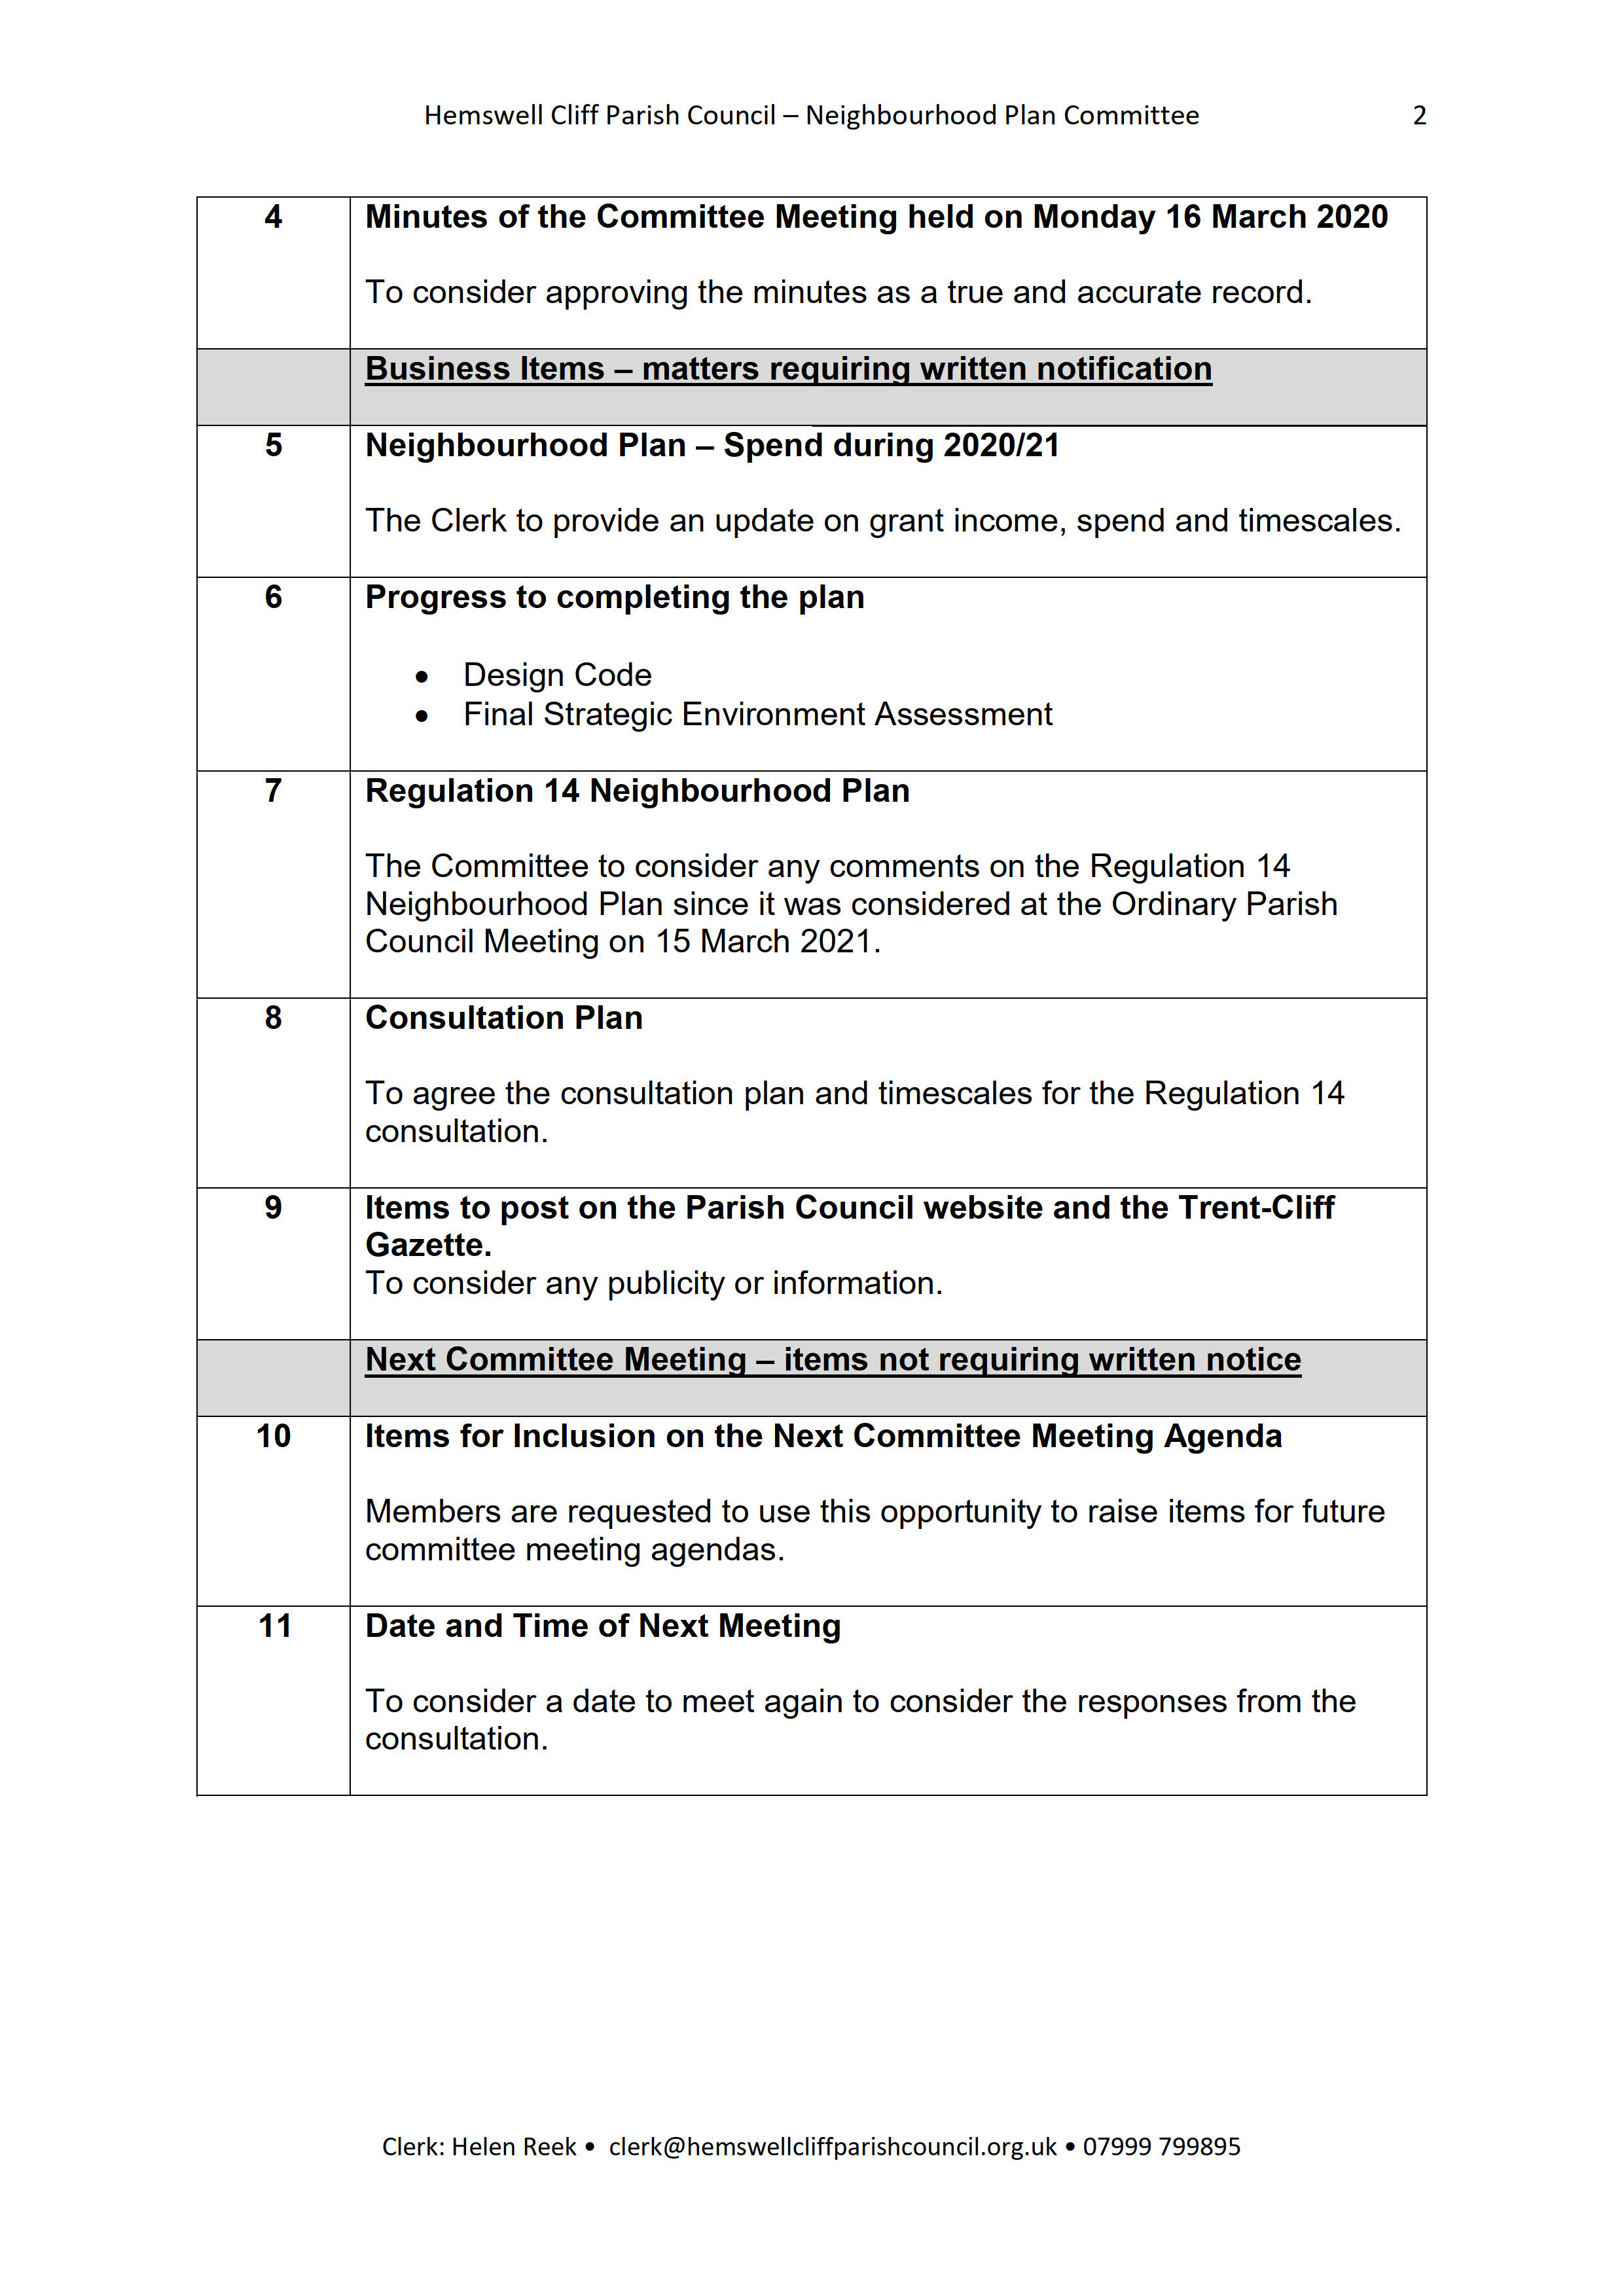 HCPC_NPC_Agenda_12.04.21_2.jpg